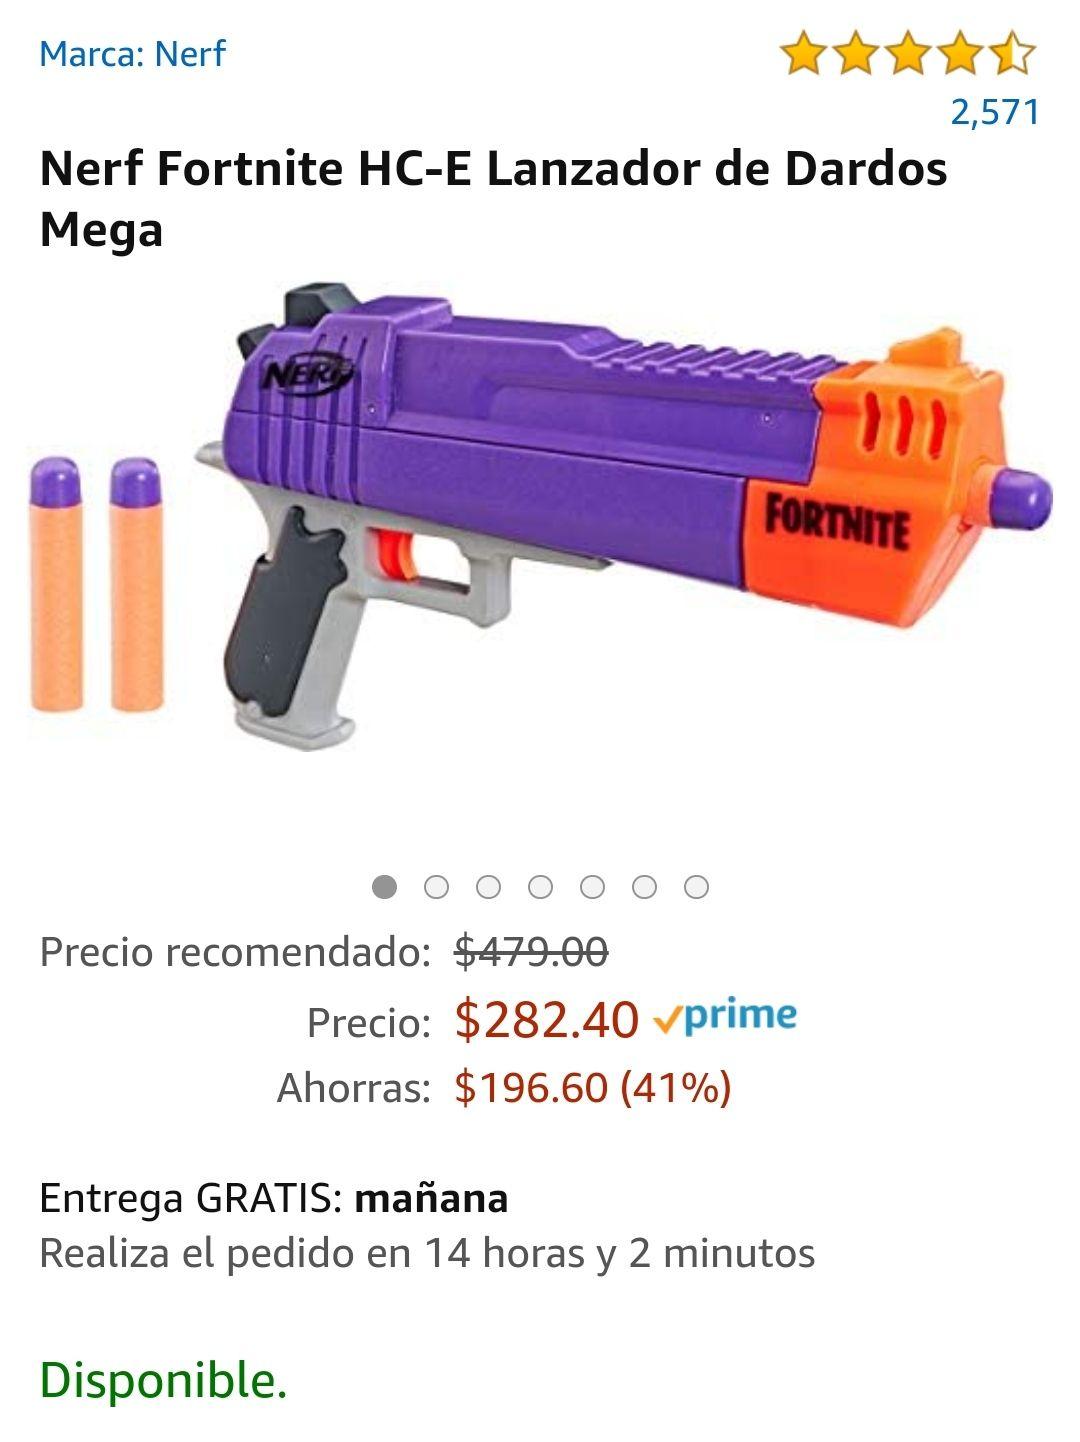 Amazon: Nerf Fortnite Lanzador de dardos Mega